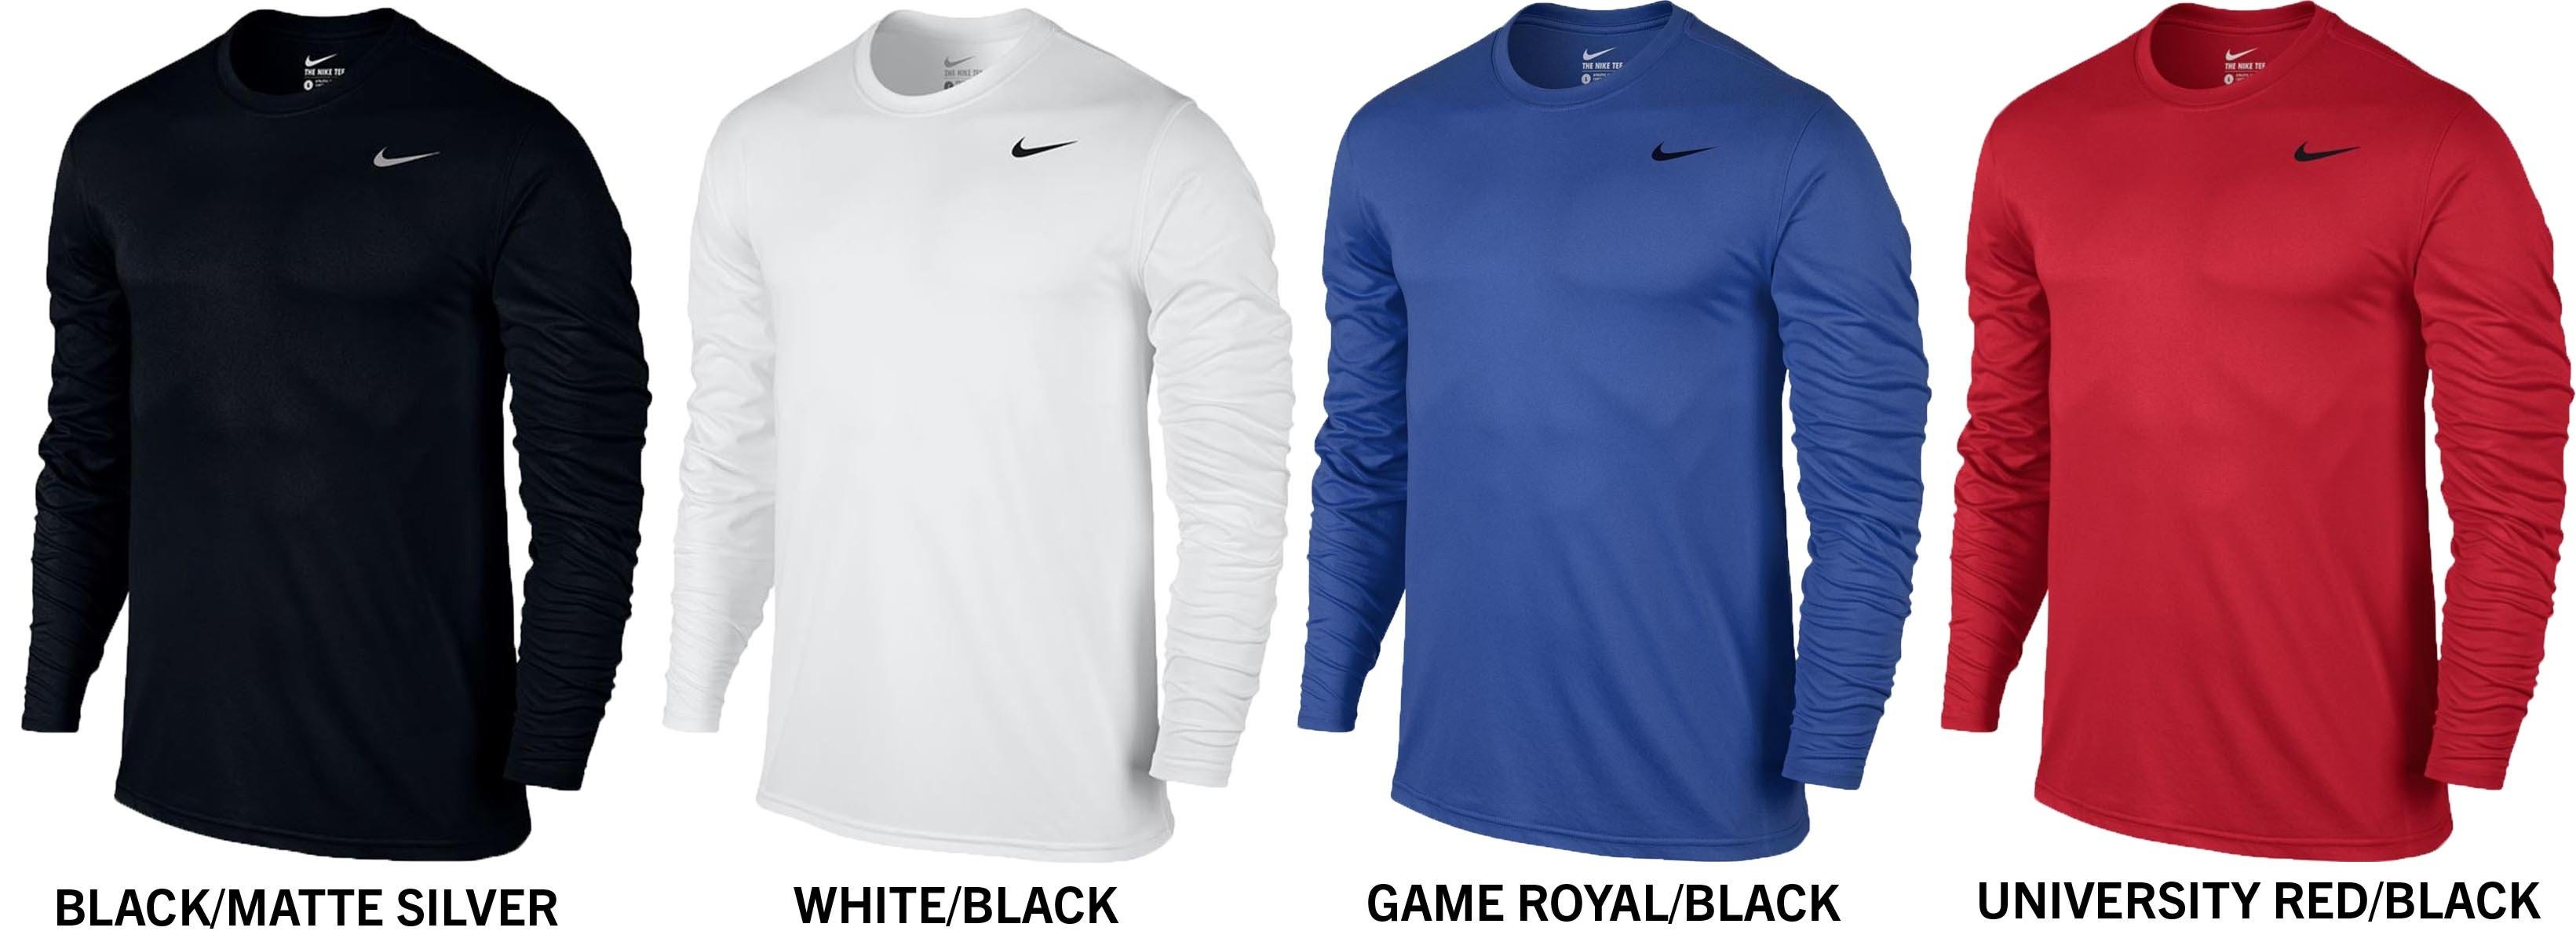 d505bb56 Nike Legend 2.0 Men's Long Sleeve Training Shirt